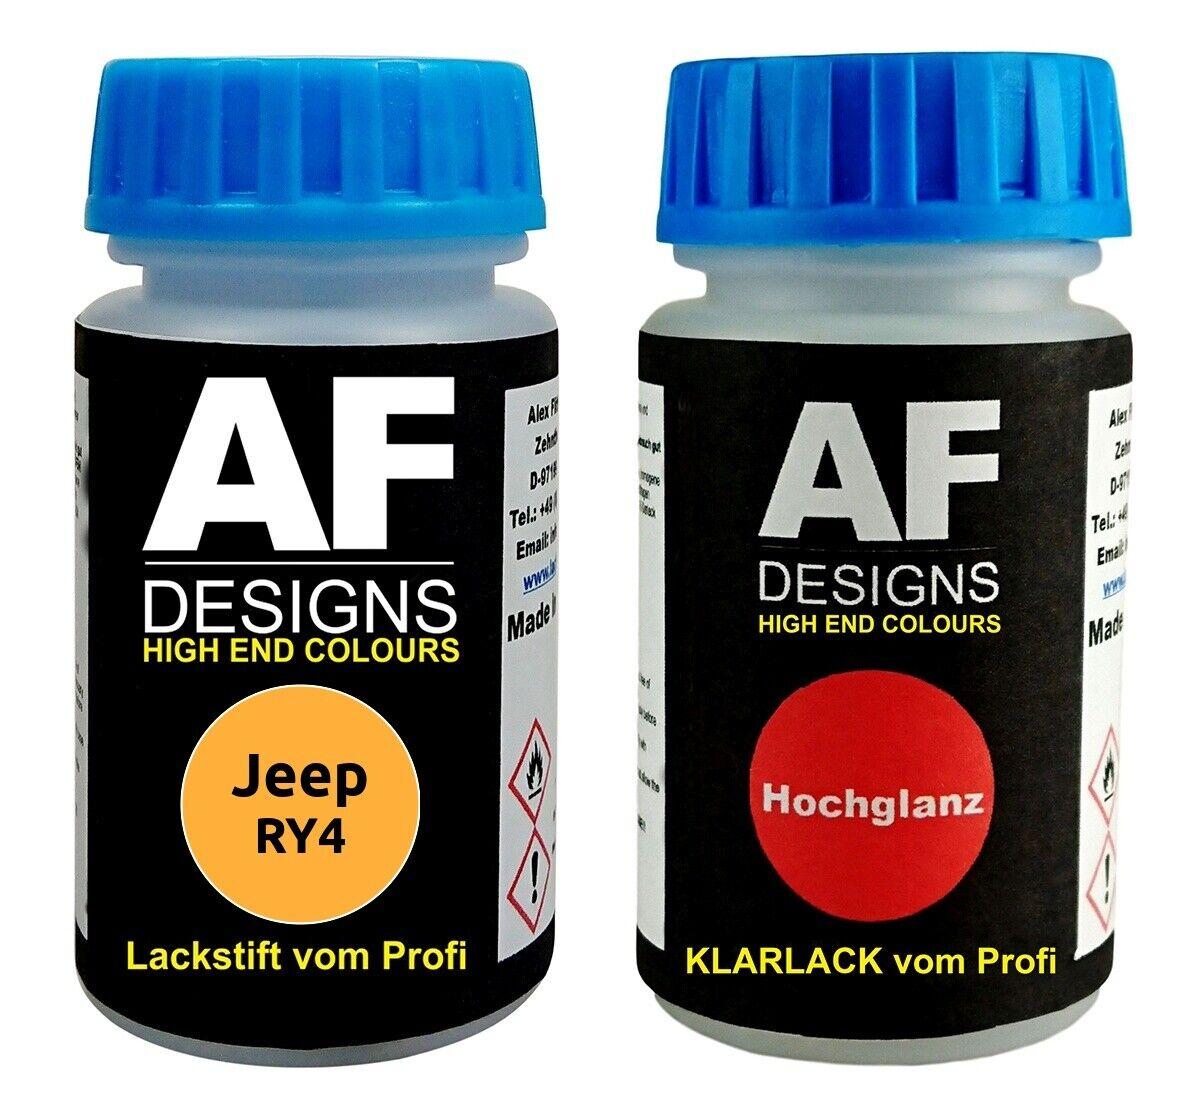 Lackstift Jeep RY4 Yellow Jacket Klarlack je 50ml Autolack Basislack SET